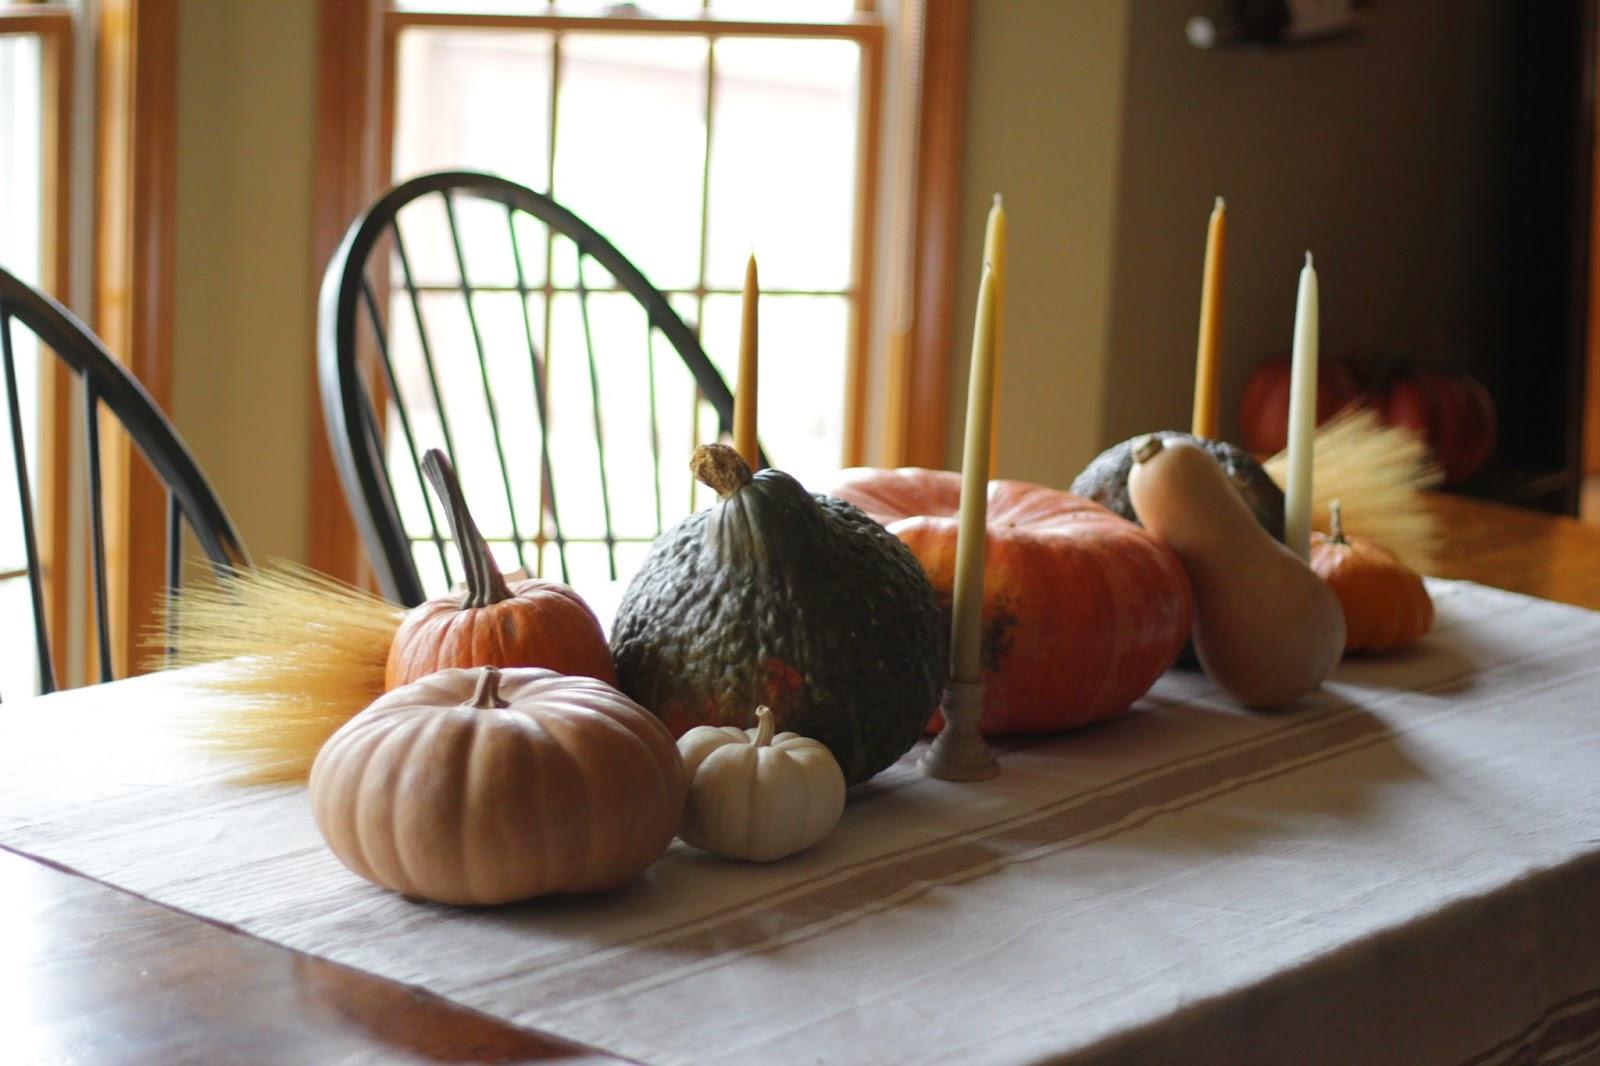 Jenny Steffens Hobick: Pumpkins & Gourds Harvest Table Setting for ...